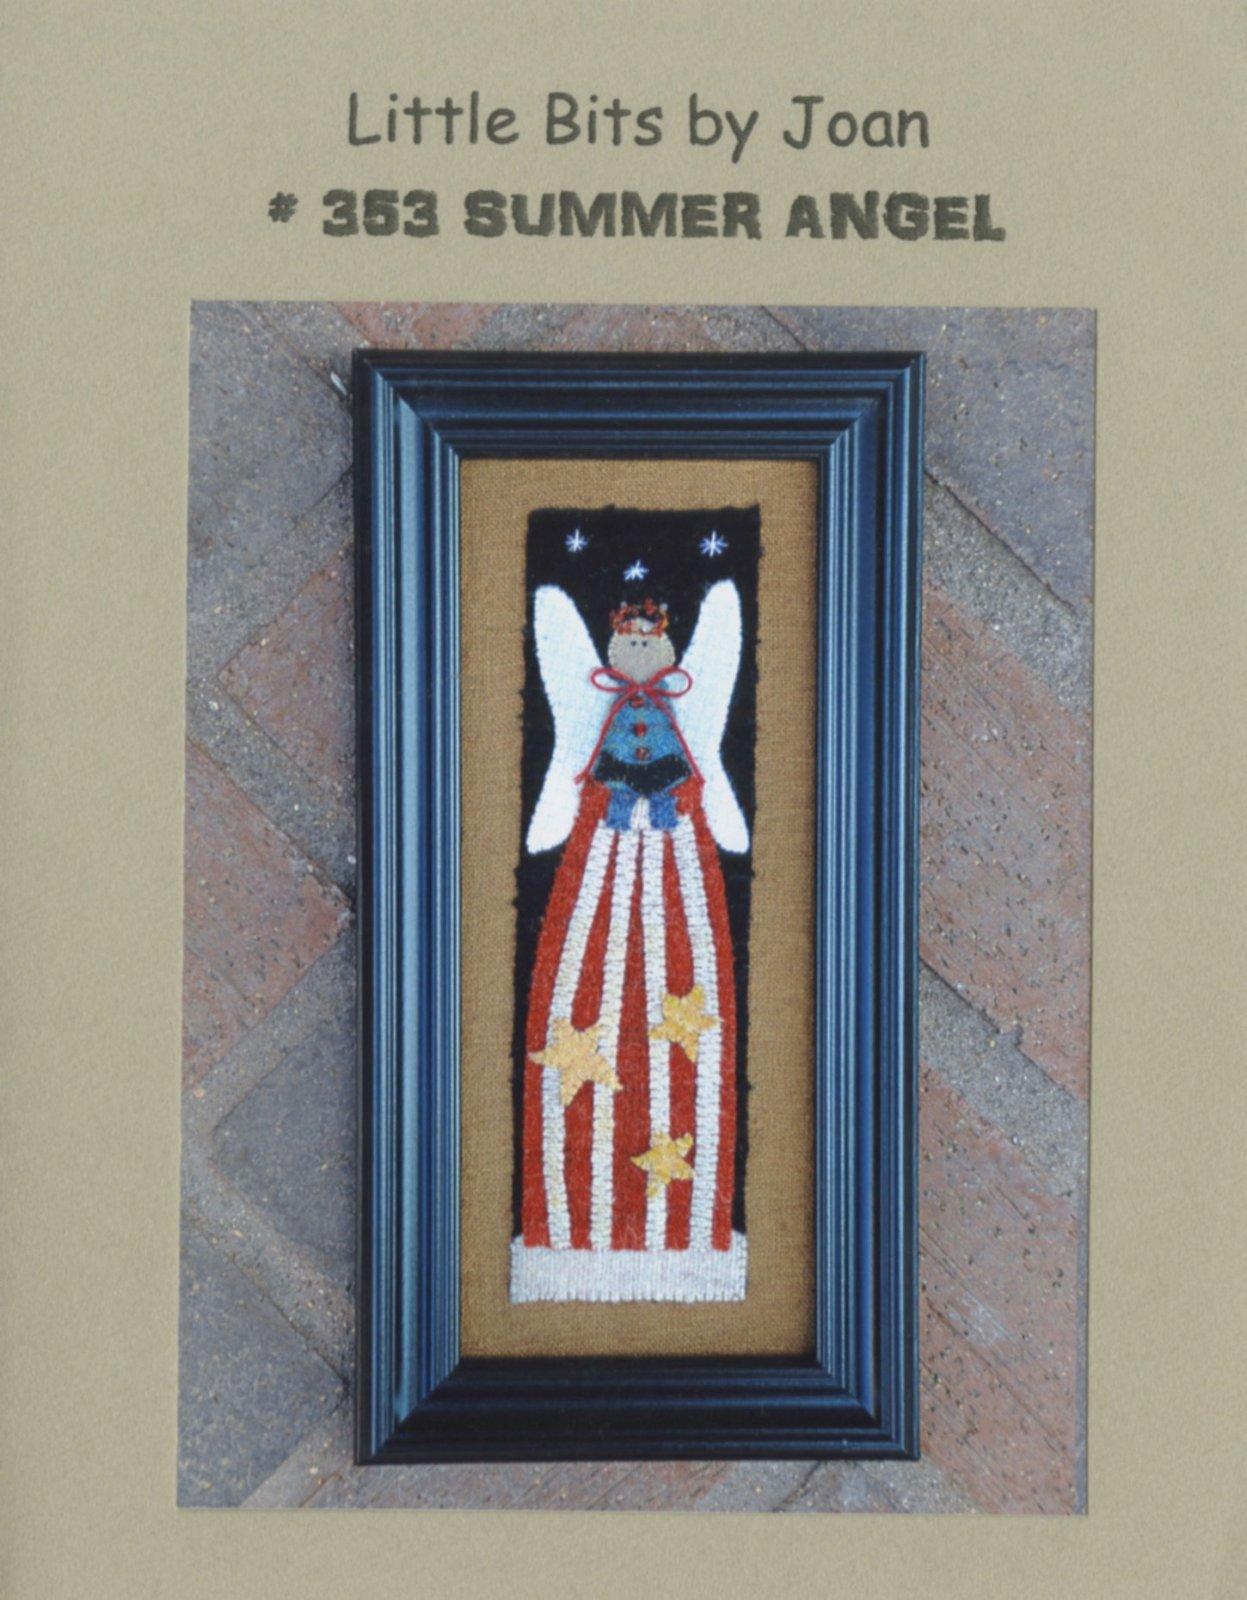 Little Bits - Summer Angel